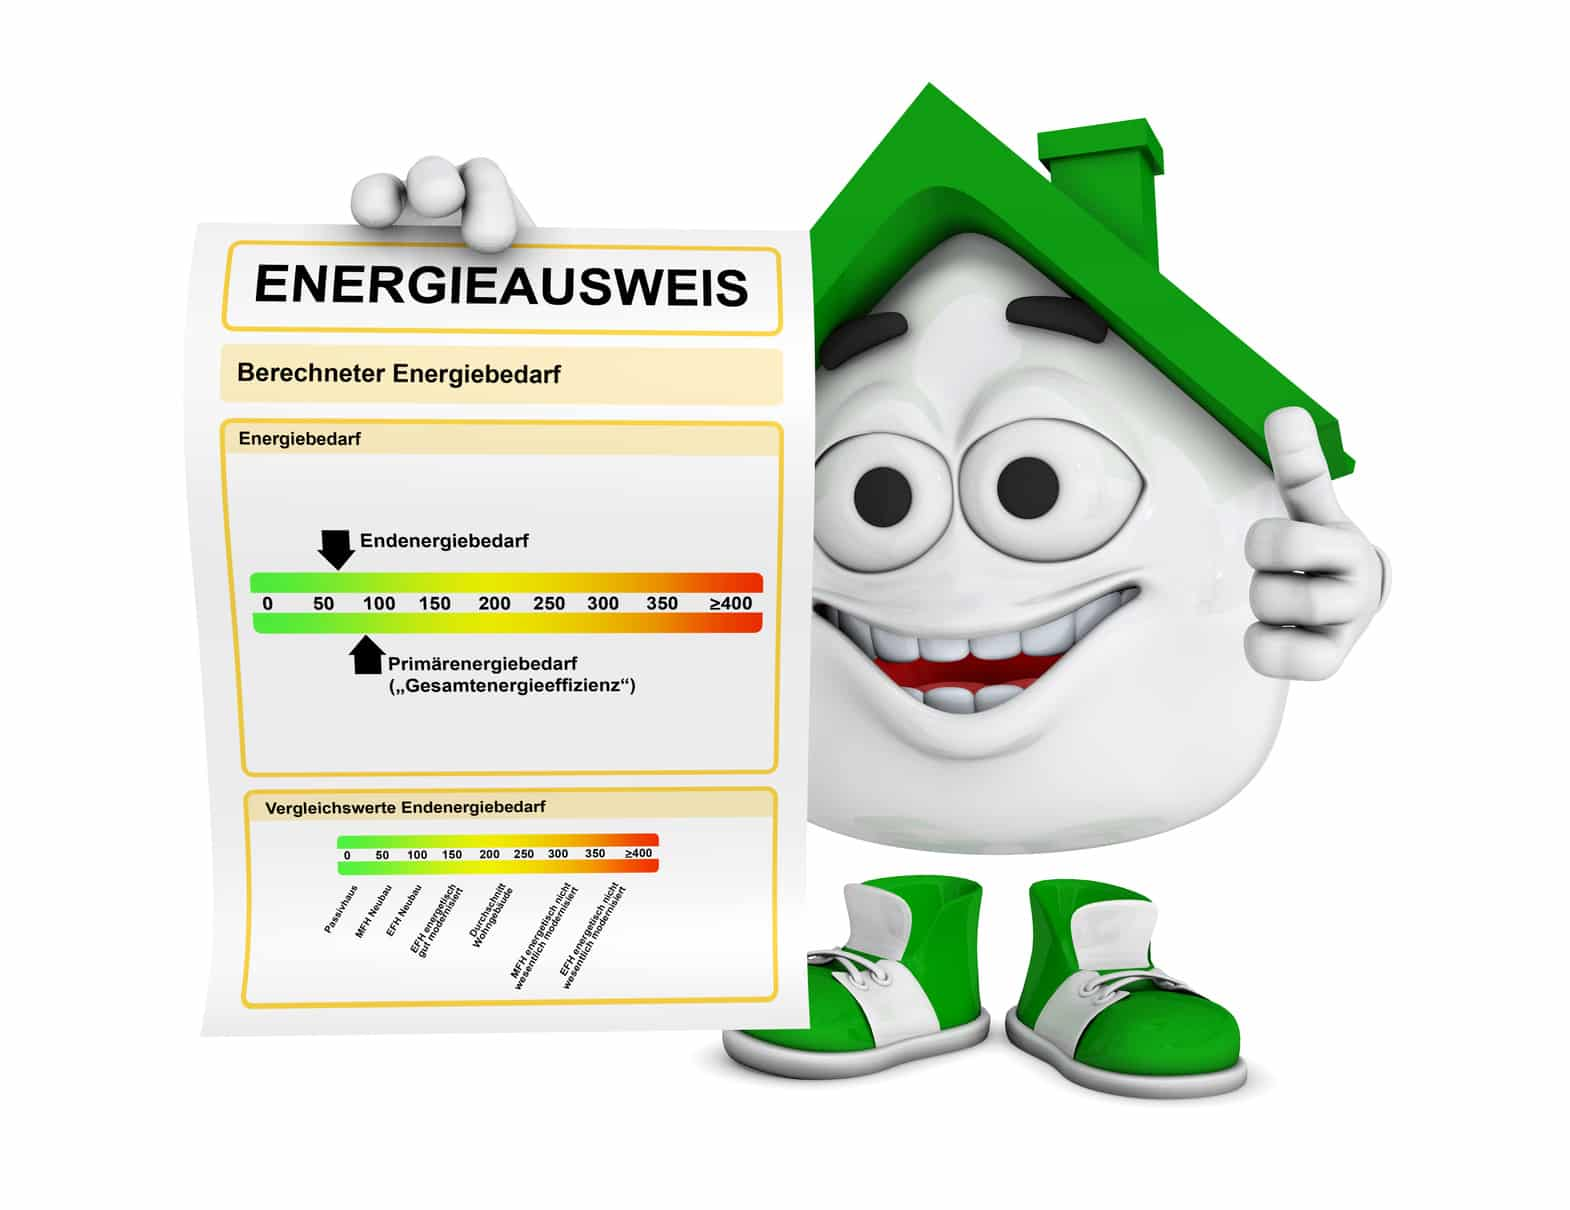 Energieausweis Männchen - Symbolbild